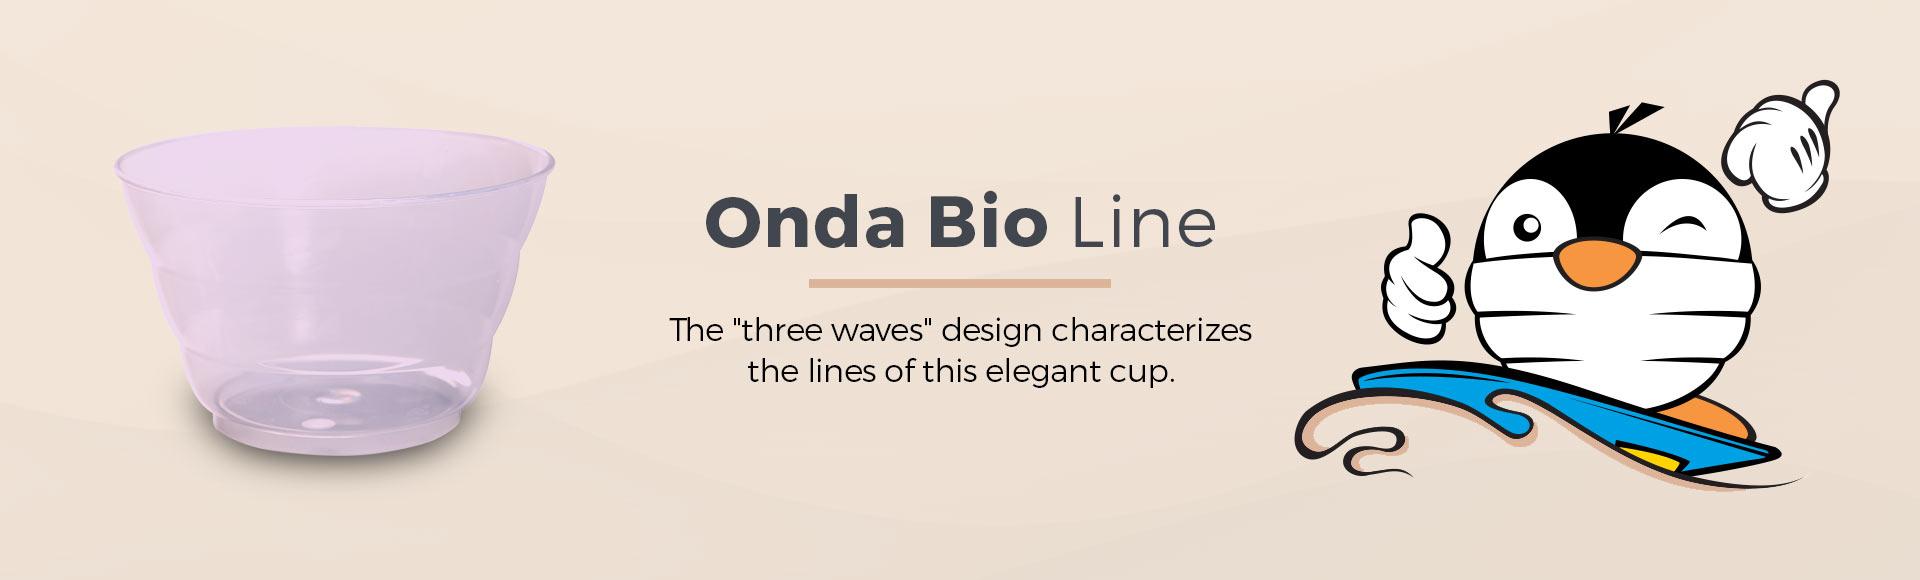 en-header-linea-bio-onda